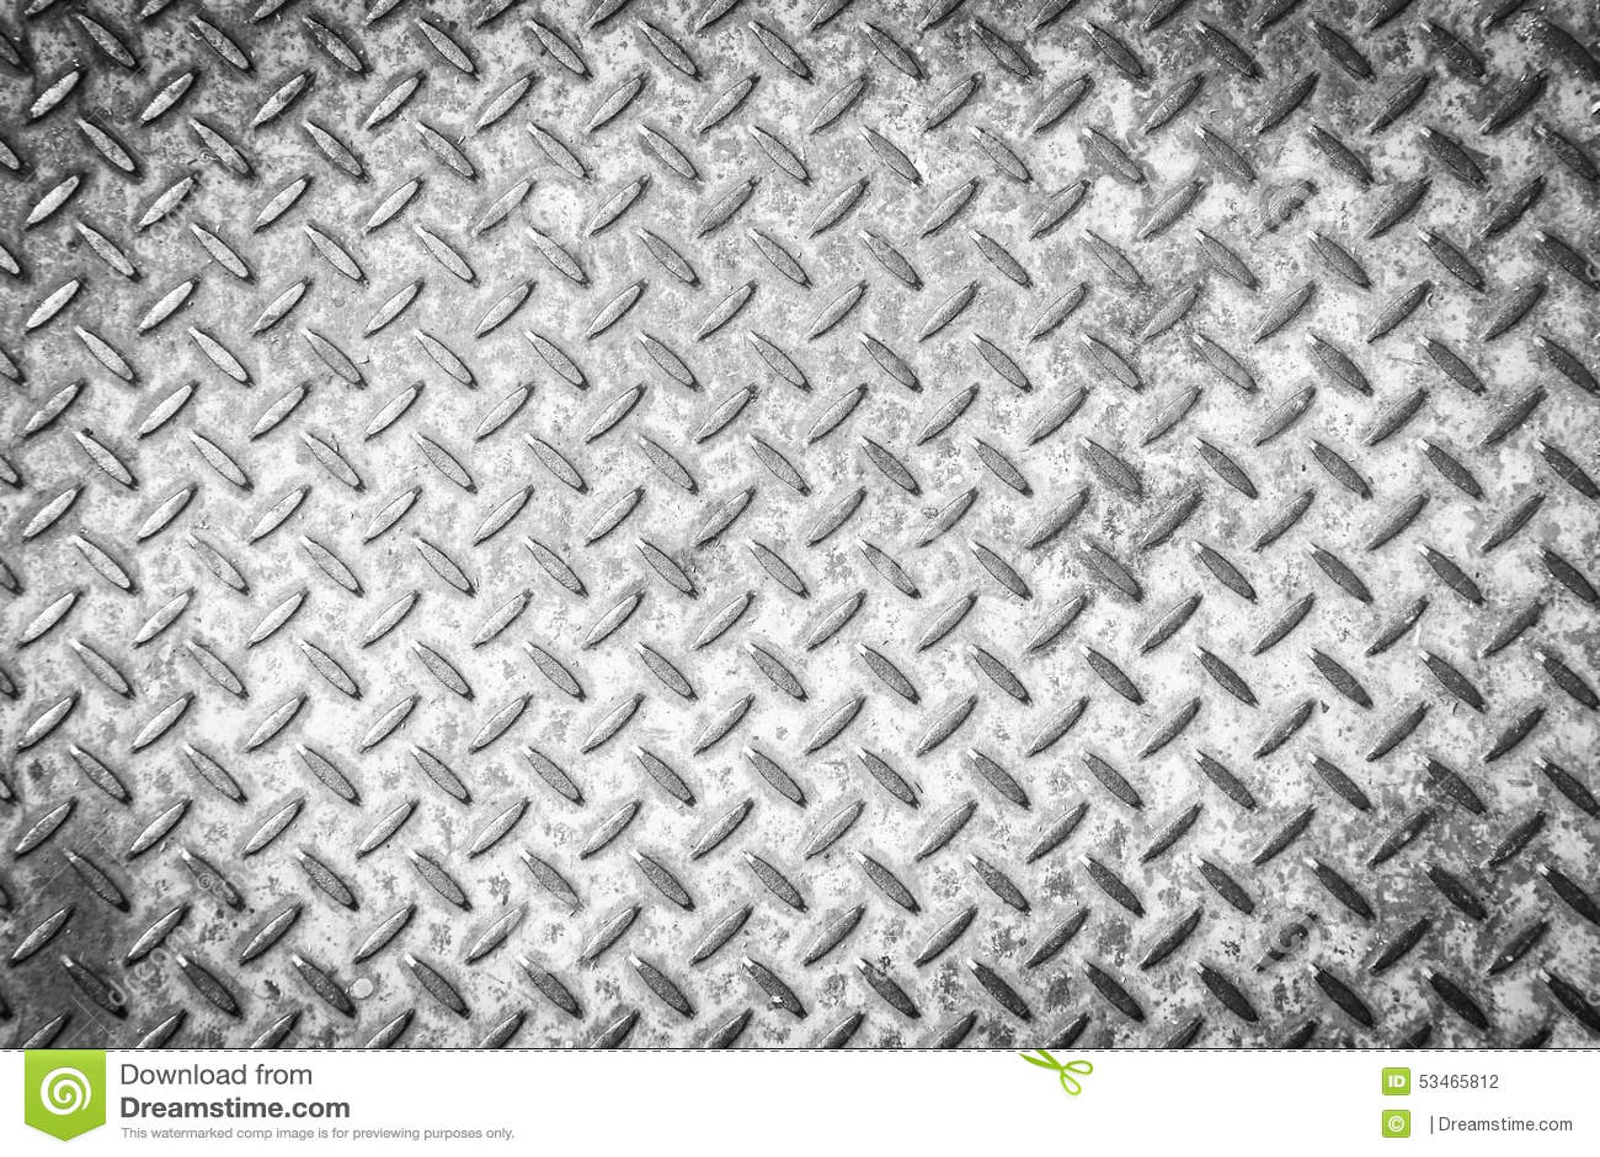 Non-slip steel grating step background